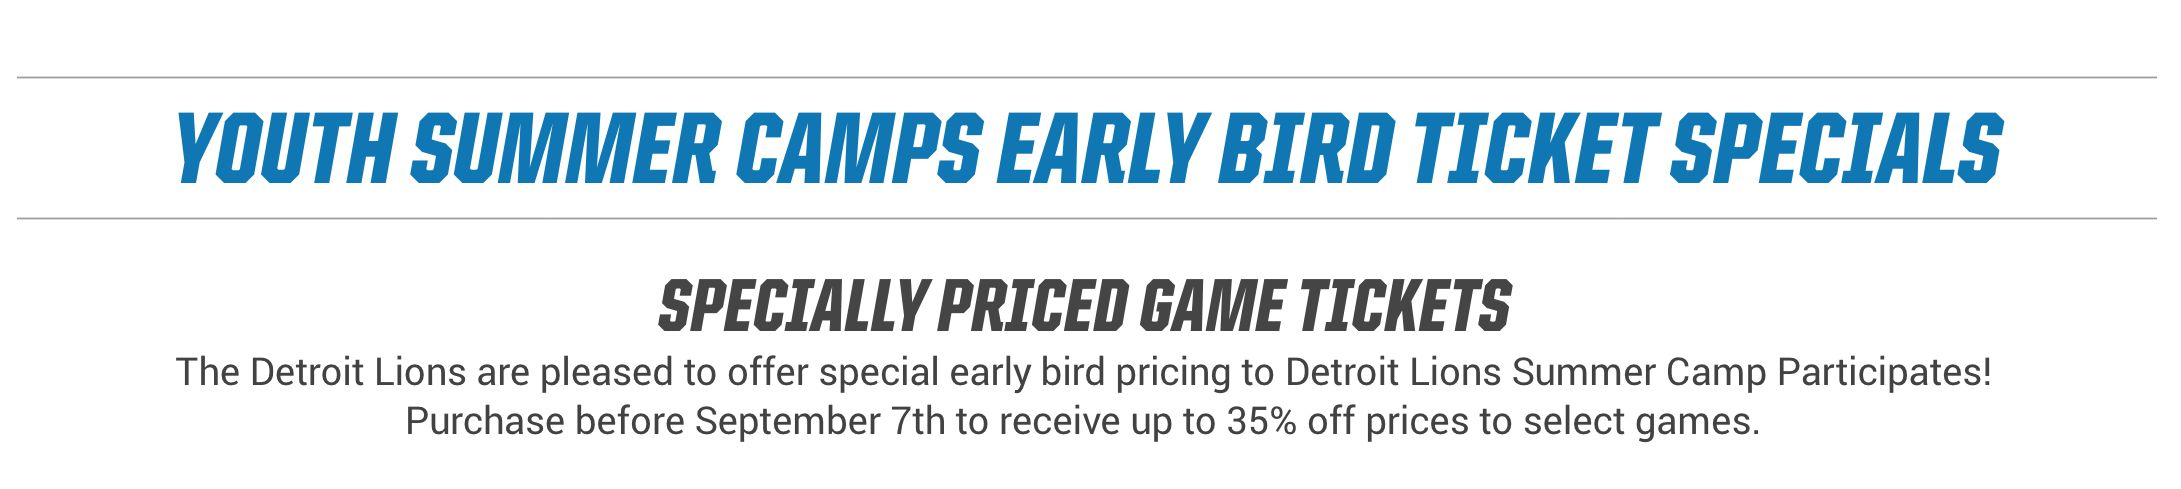 ticket-offer-summer-camps-top-headline